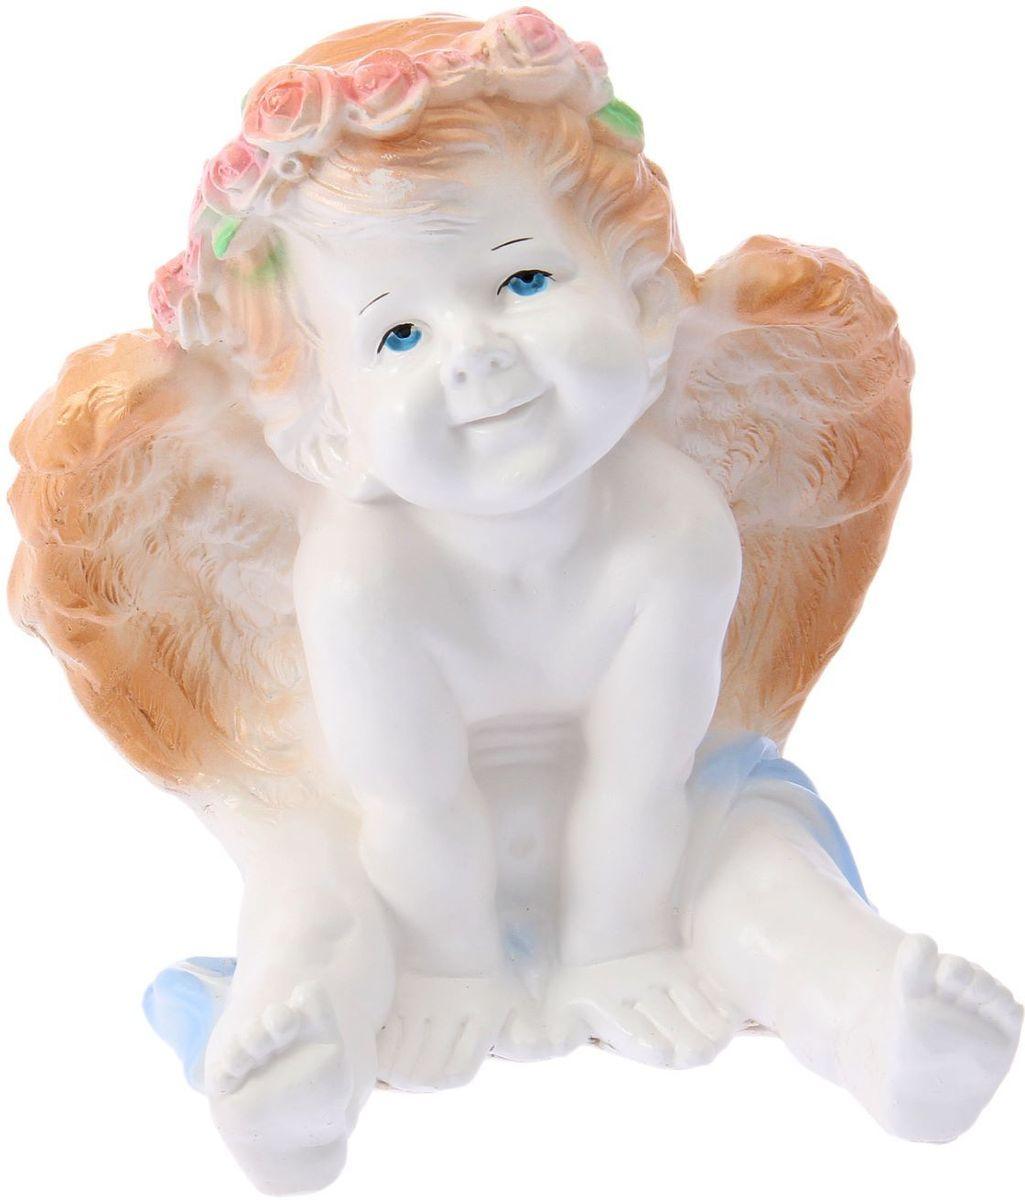 Фигура садовая Ангел карапуз сидя, цвет: белый, золотистый, 20 х 20 х 25 см